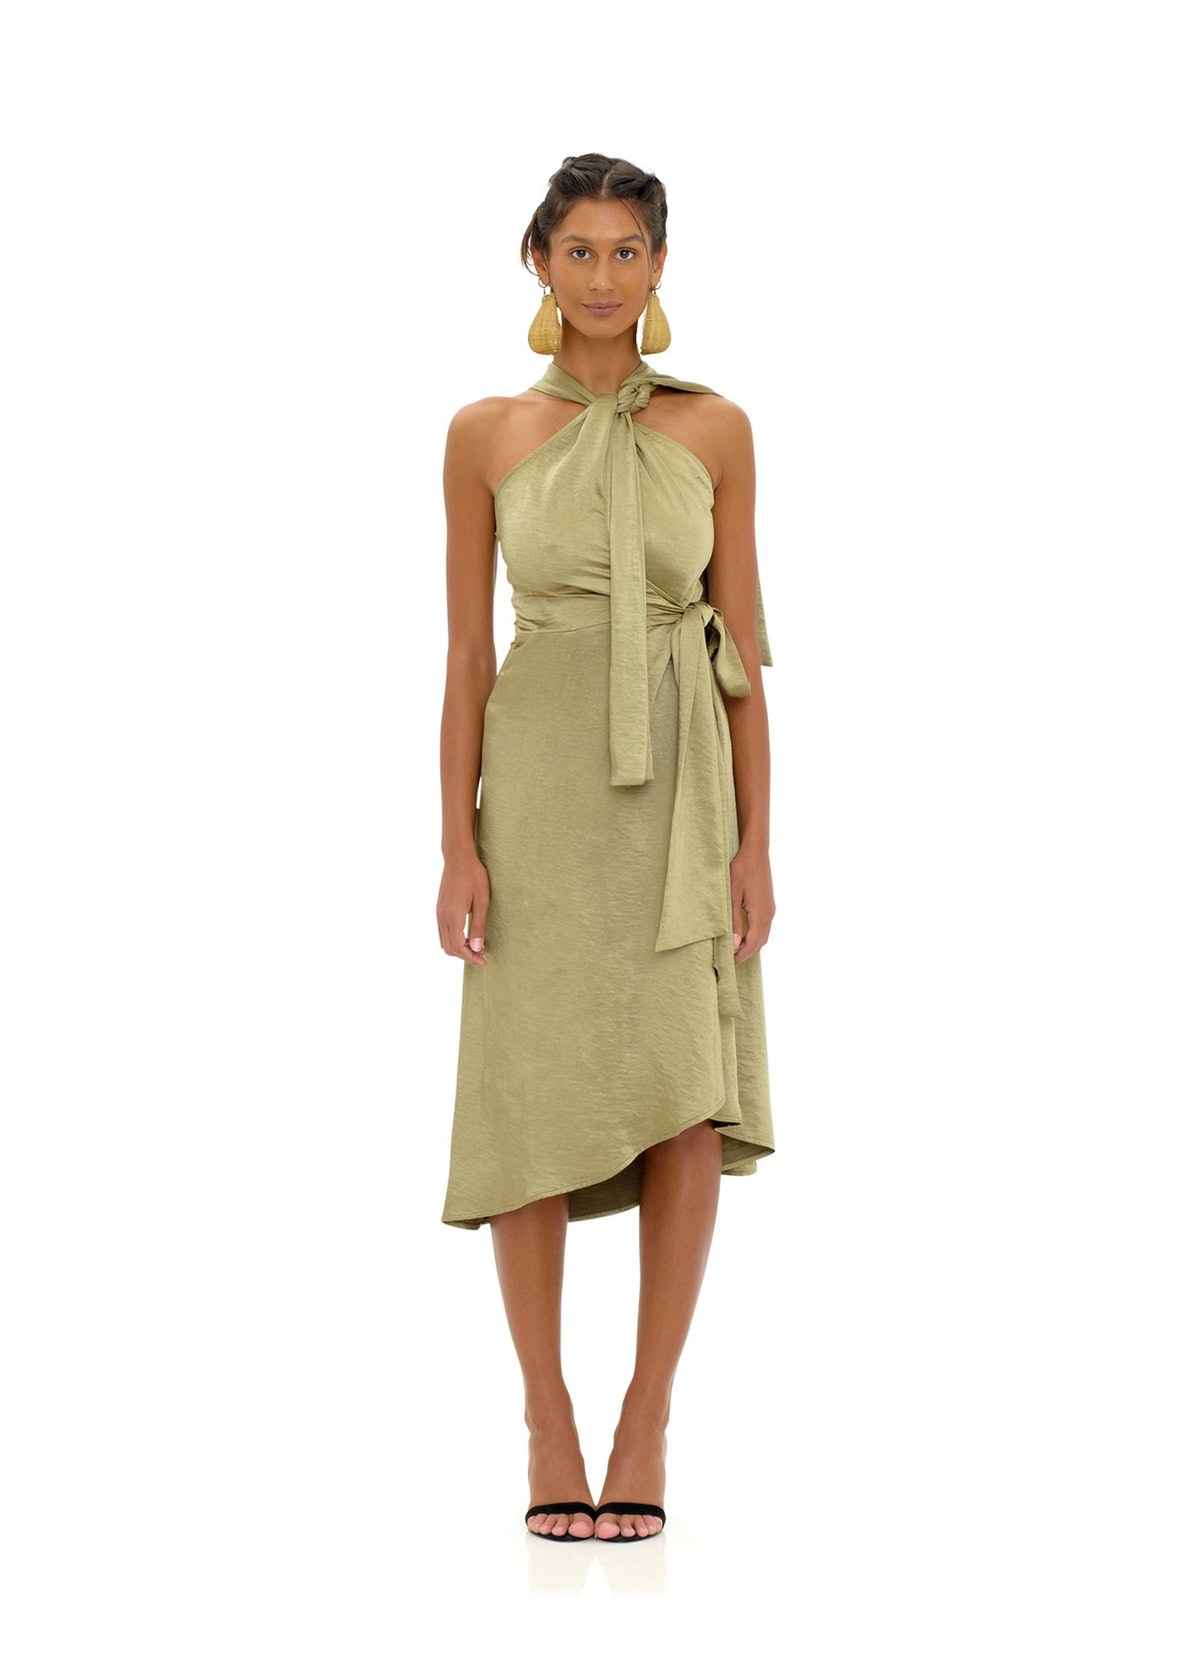 Olen Wrap Halter Dress from Andrea Iyamah.